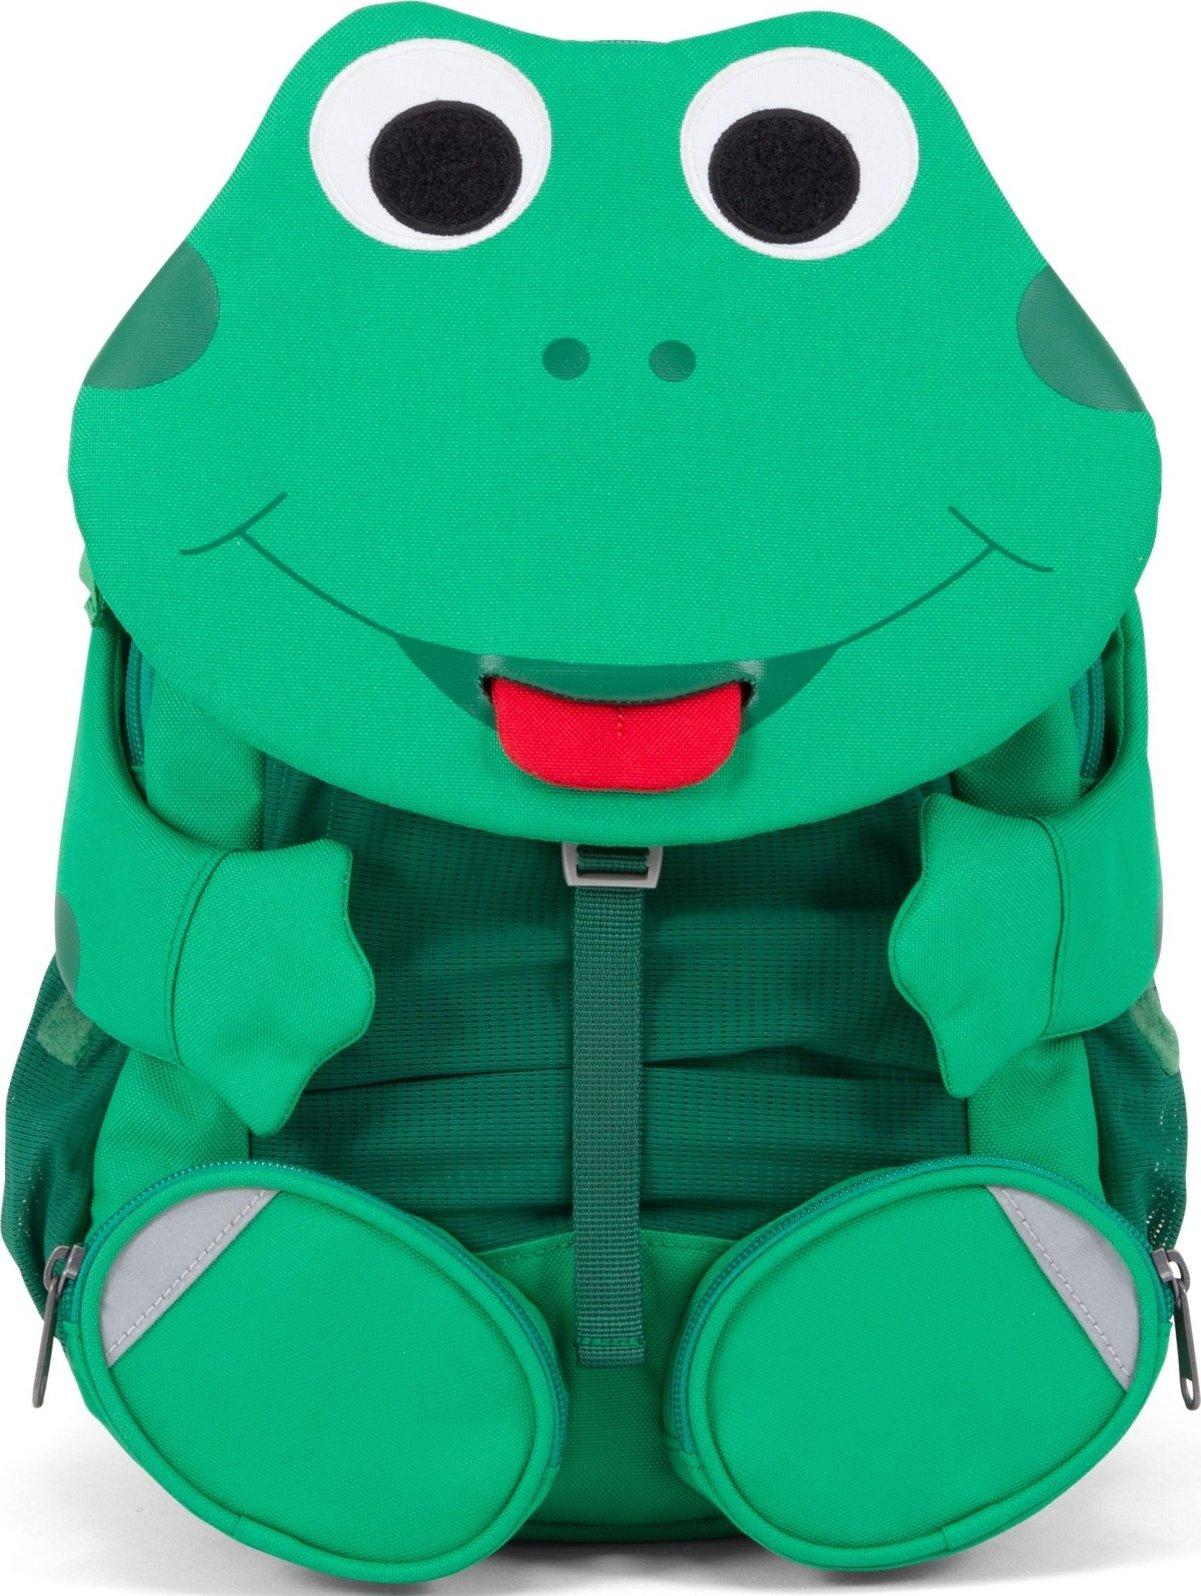 412539219d Affenzahn Fabian Frog Large 8l zelený od 1 380 Kč